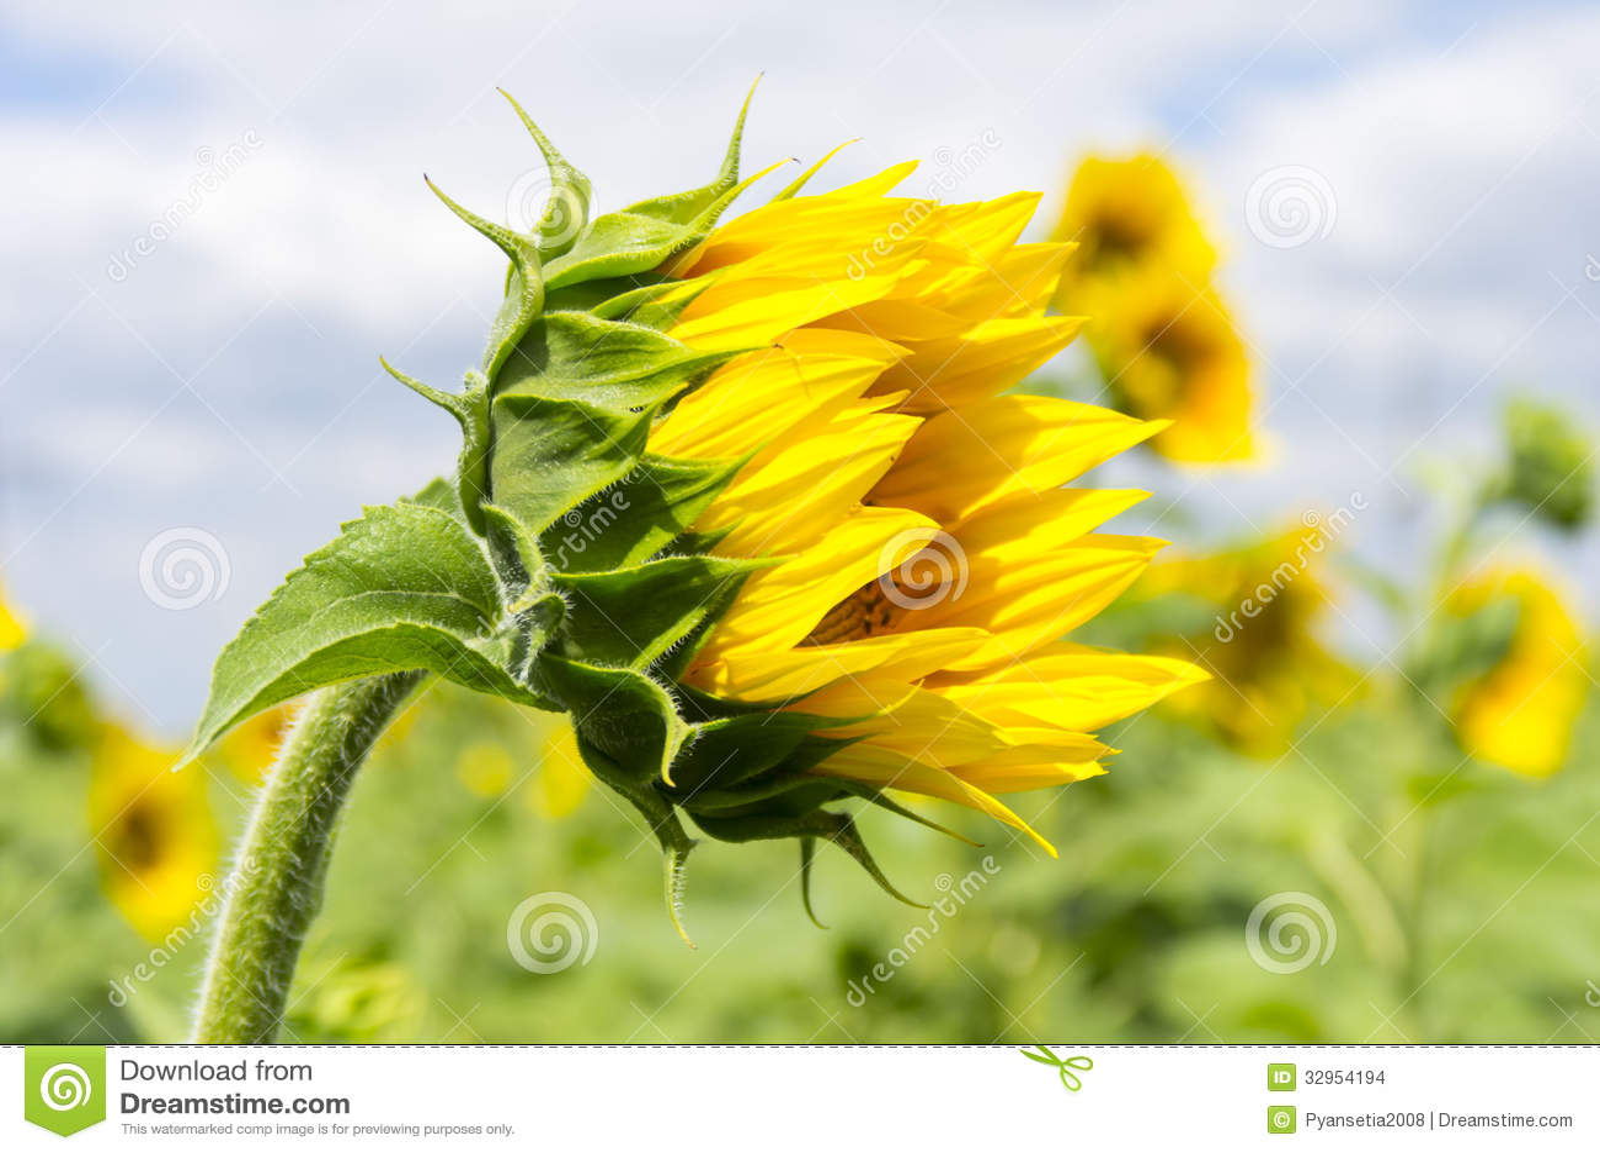 buds | Portraits of Wildflowers | Page 4  |Sunflower Bud